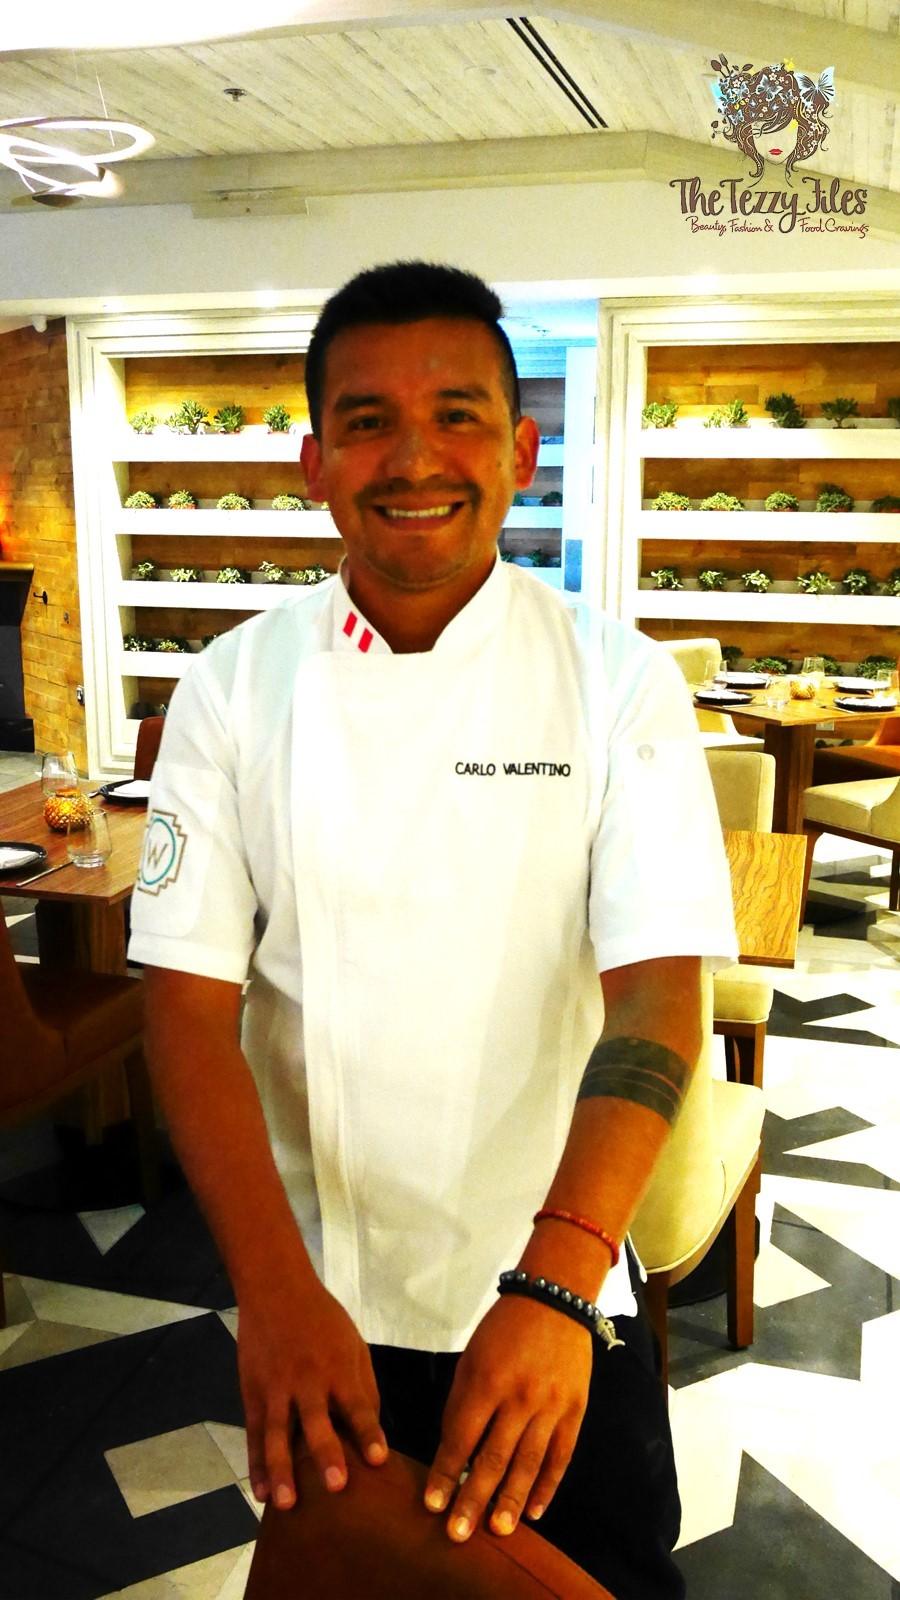 Waka Dubai The Oberoi Review Latin American Fusion Peruvian Cuisine Food Blogger The Tezzy Files Dubai Lifestyle Blog UAE Fine Dining Bar Restaurant (18)